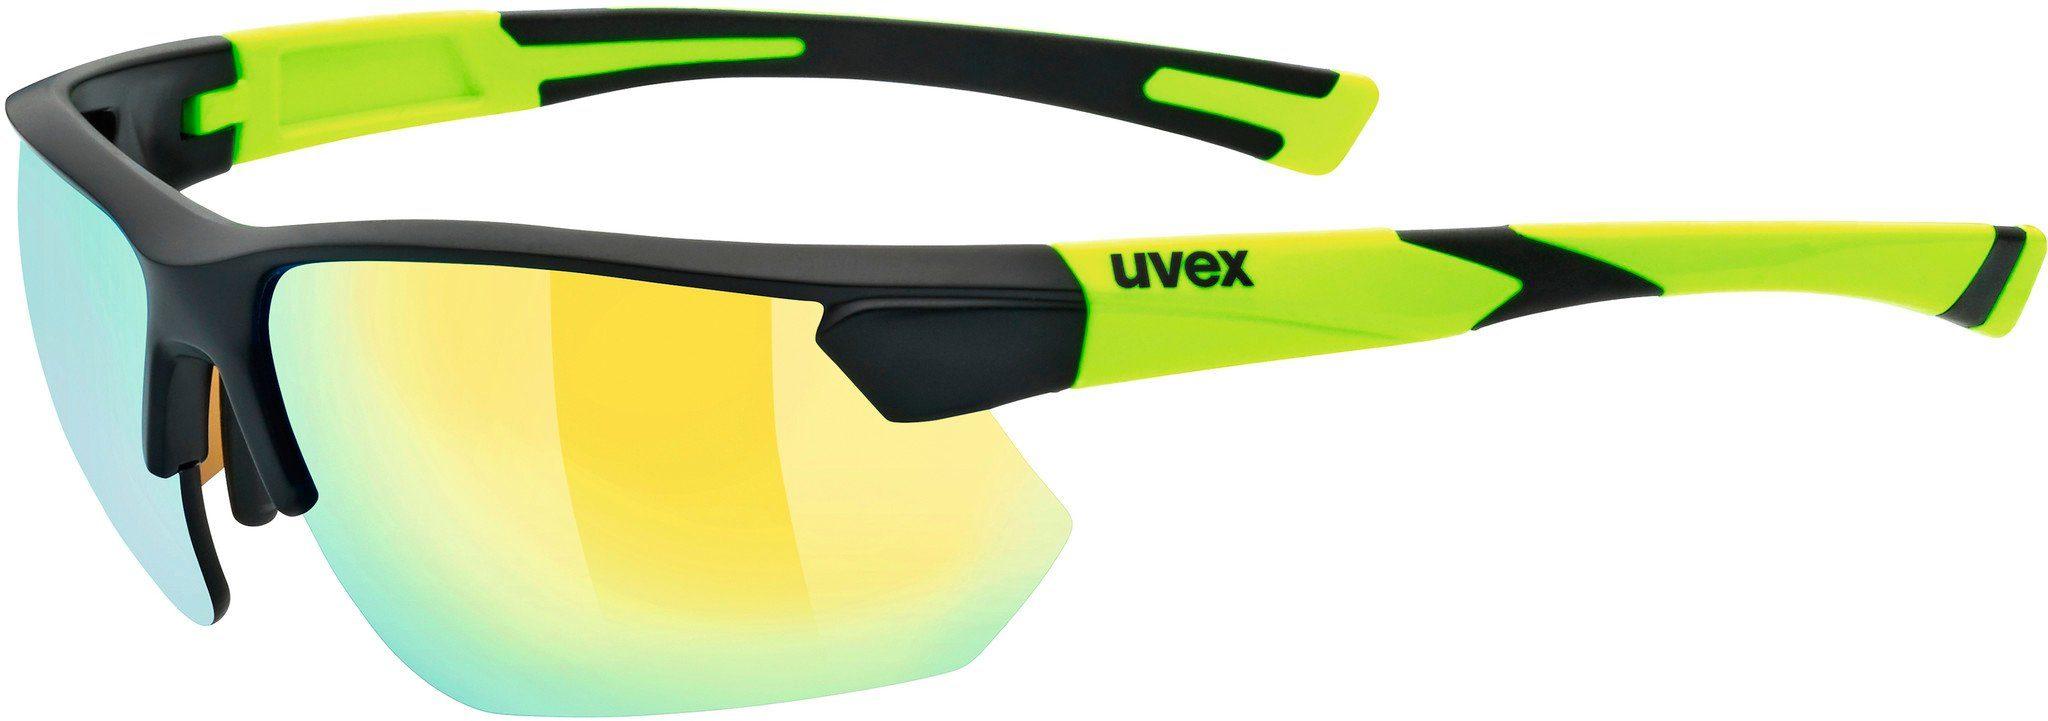 Uvex Radsportbrille »UVEX sportstyle 221 Glasses«